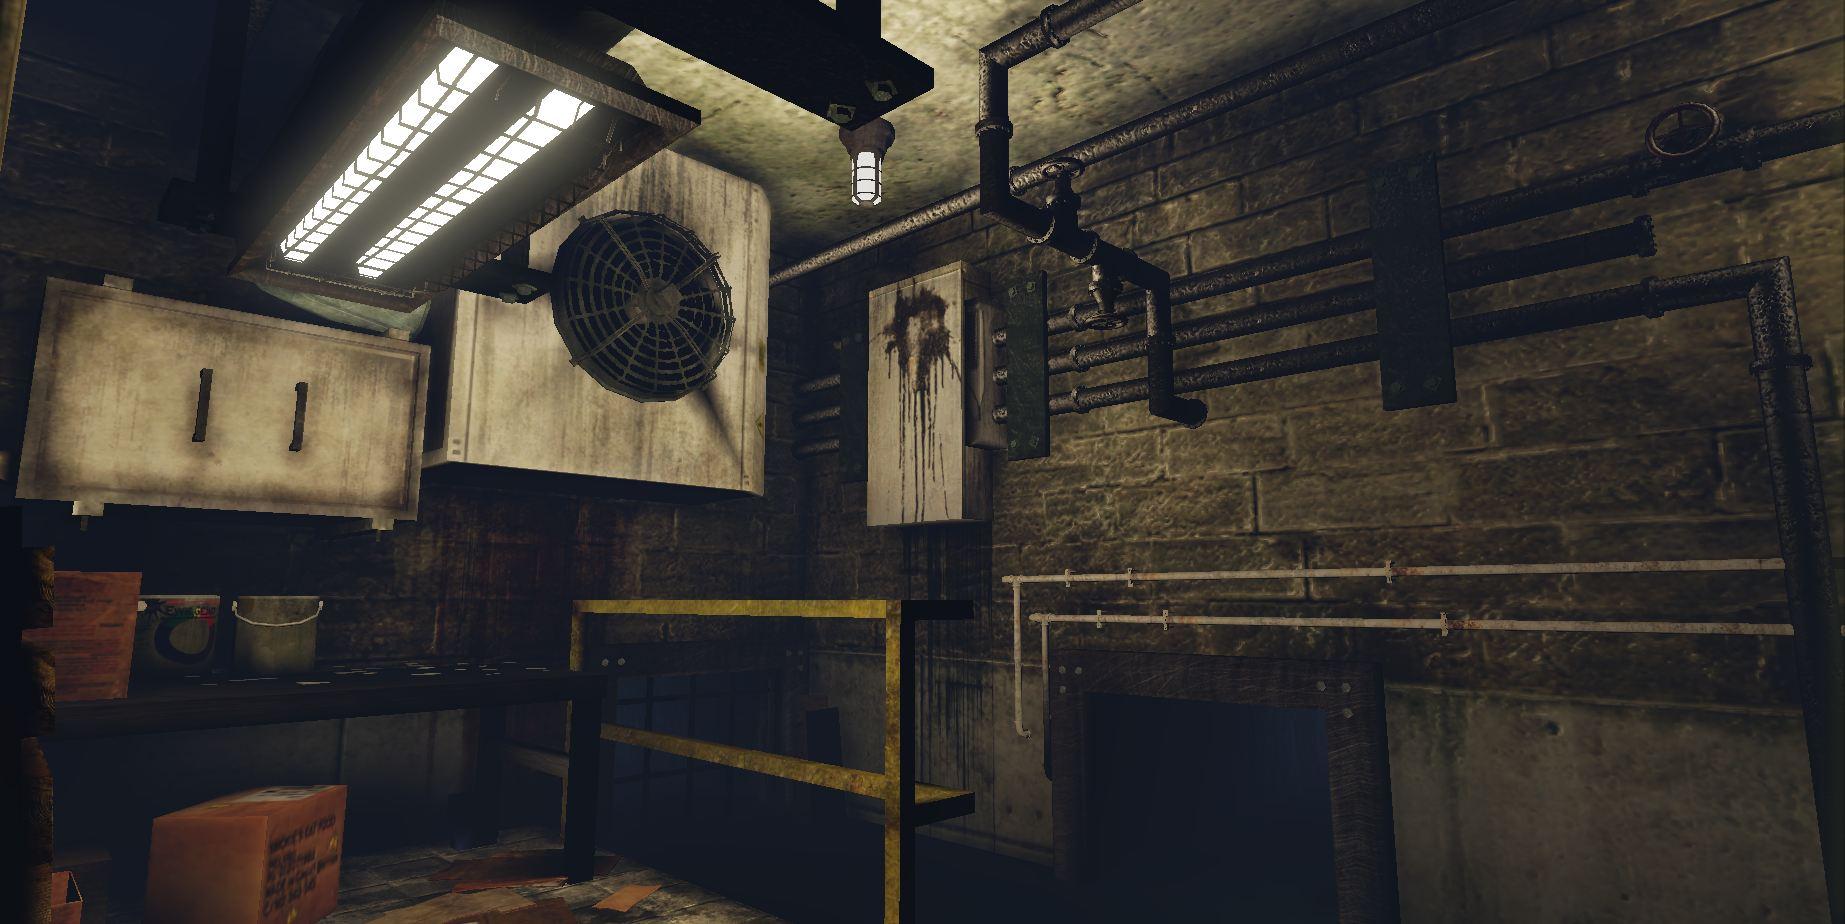 Maintenance_Room_01.JPG